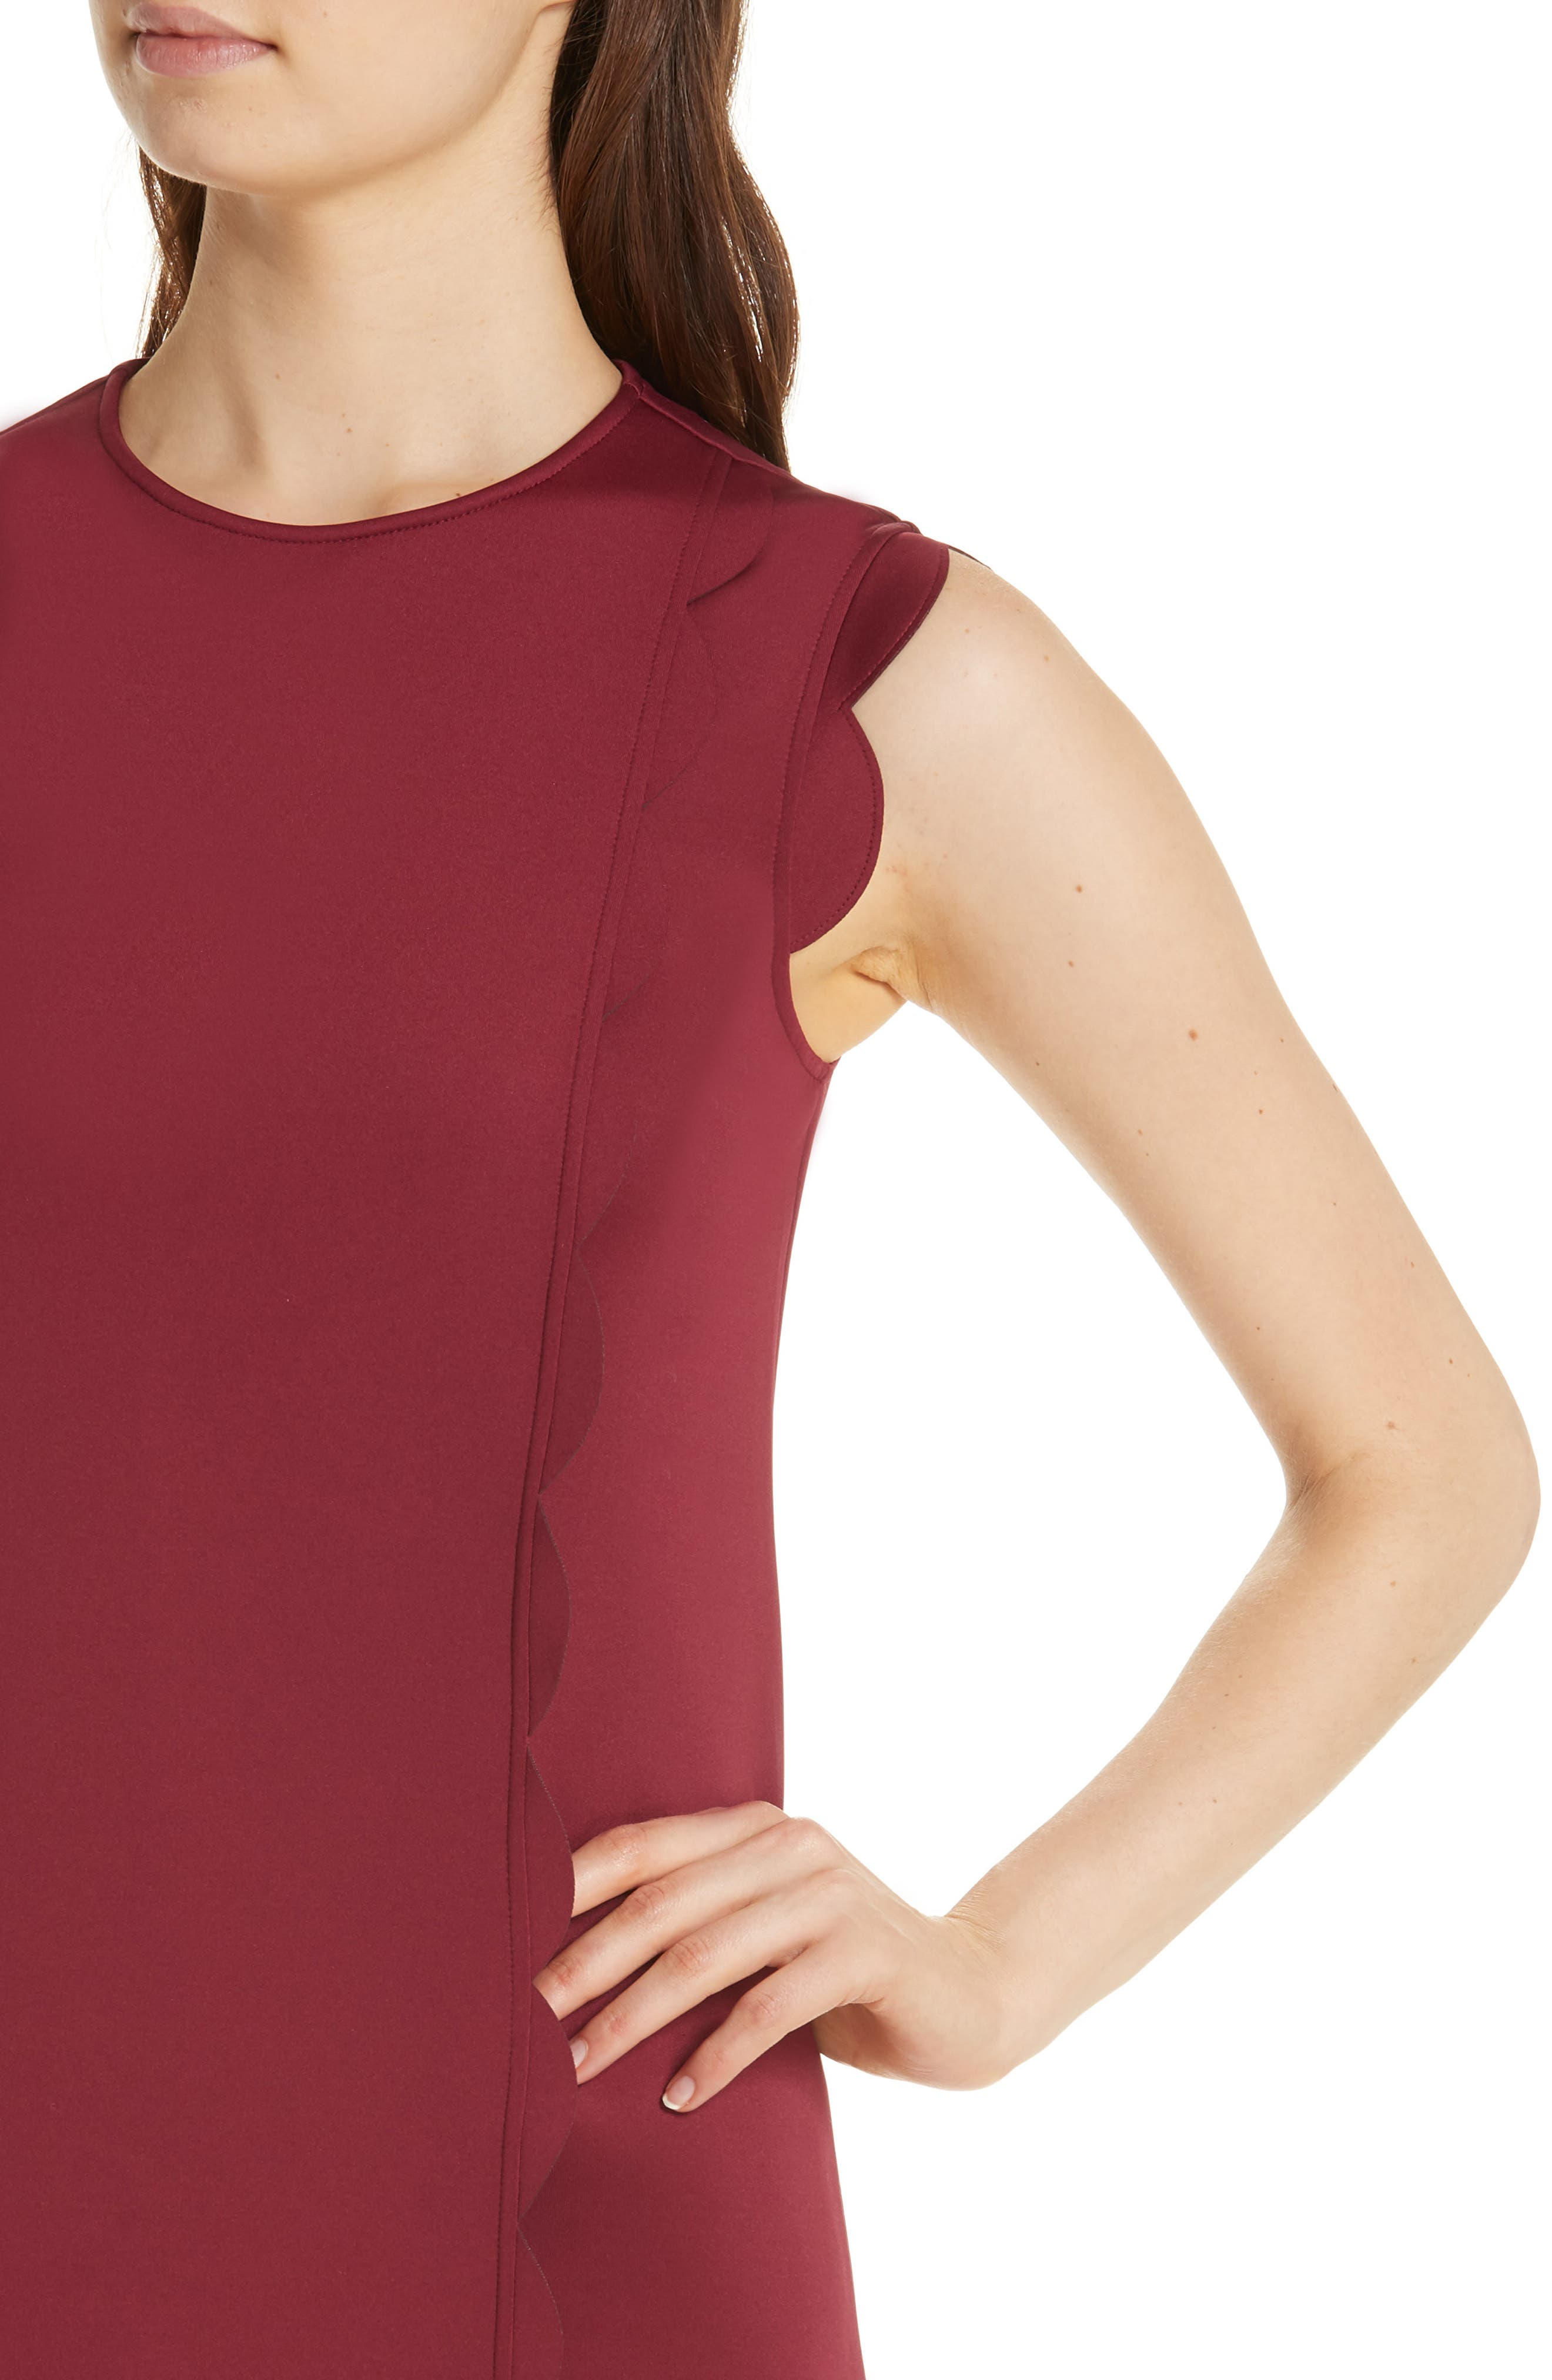 TED BAKER LONDON, Jasmint Scallop Overlay Dress, Alternate thumbnail 5, color, MAROON